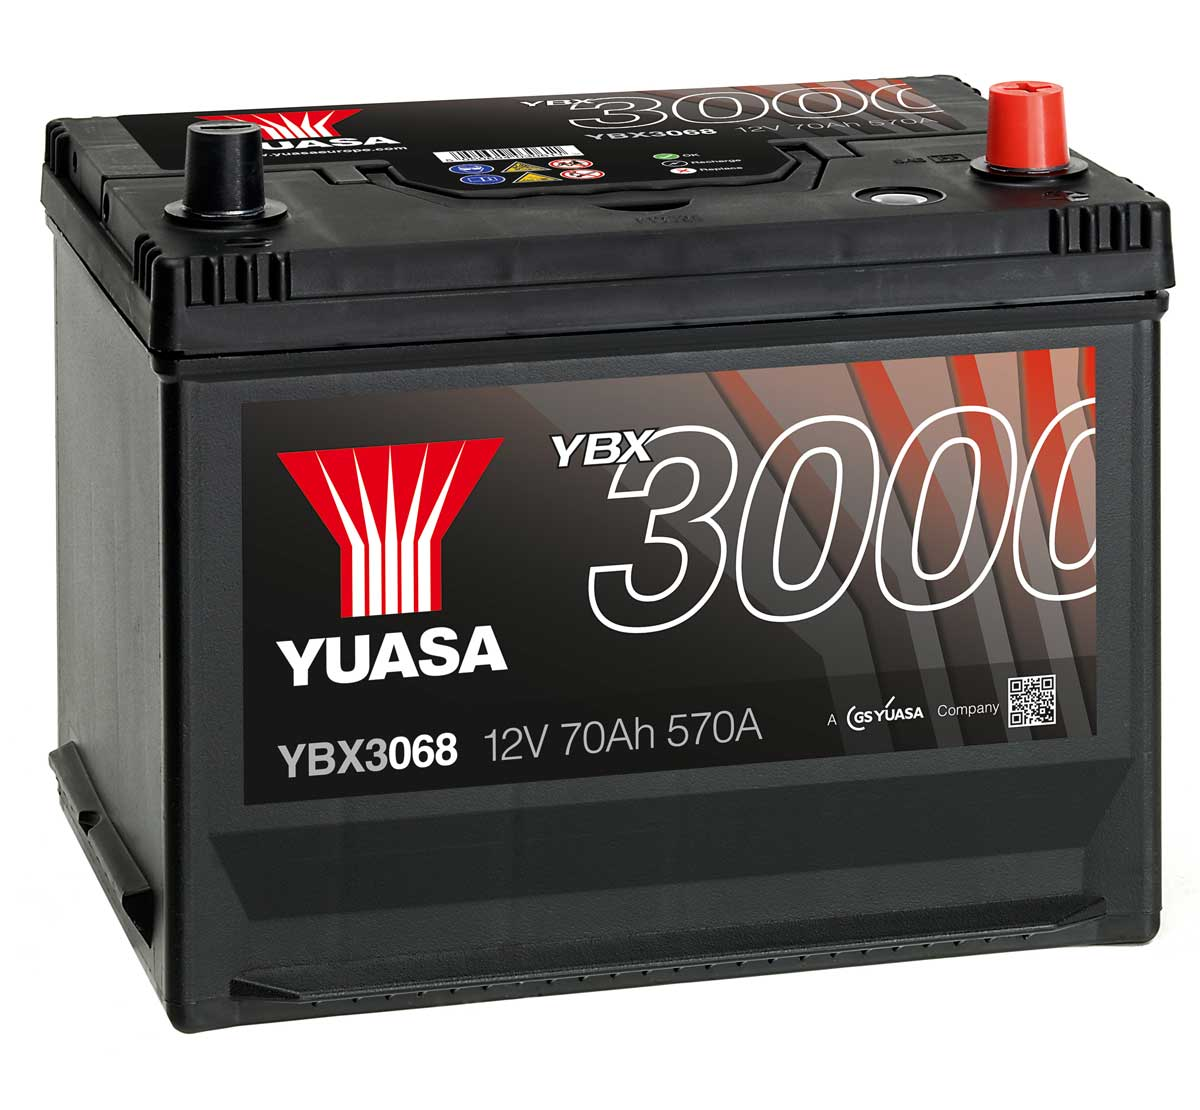 yuasa ybx3068 12v car battery mds battery. Black Bedroom Furniture Sets. Home Design Ideas